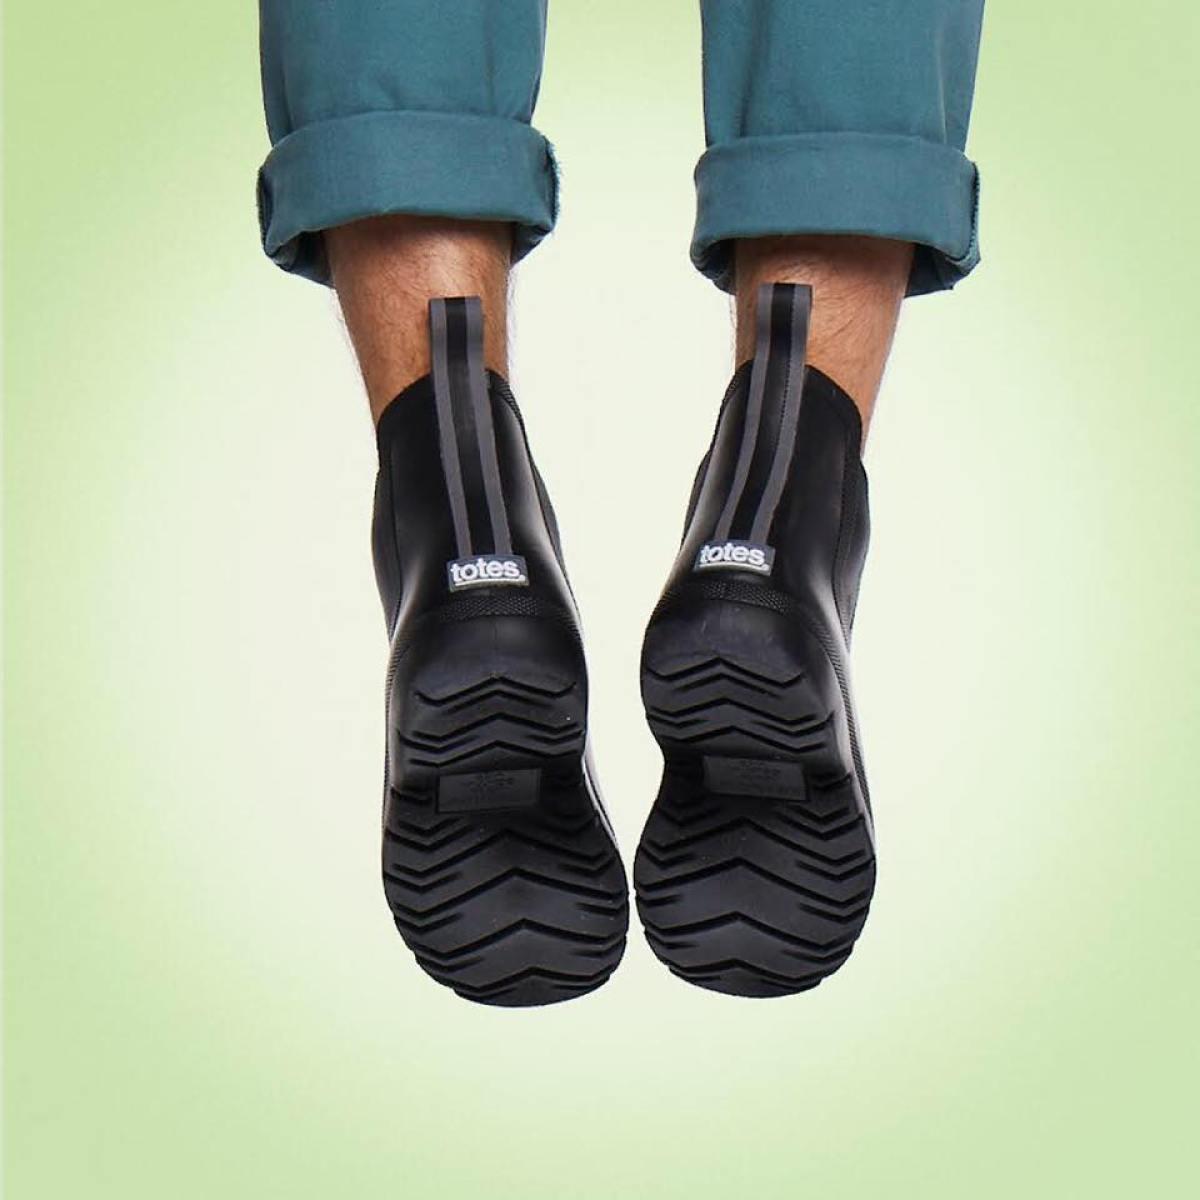 Cirrus men's Tote Rainboots shown on man dangling his feet